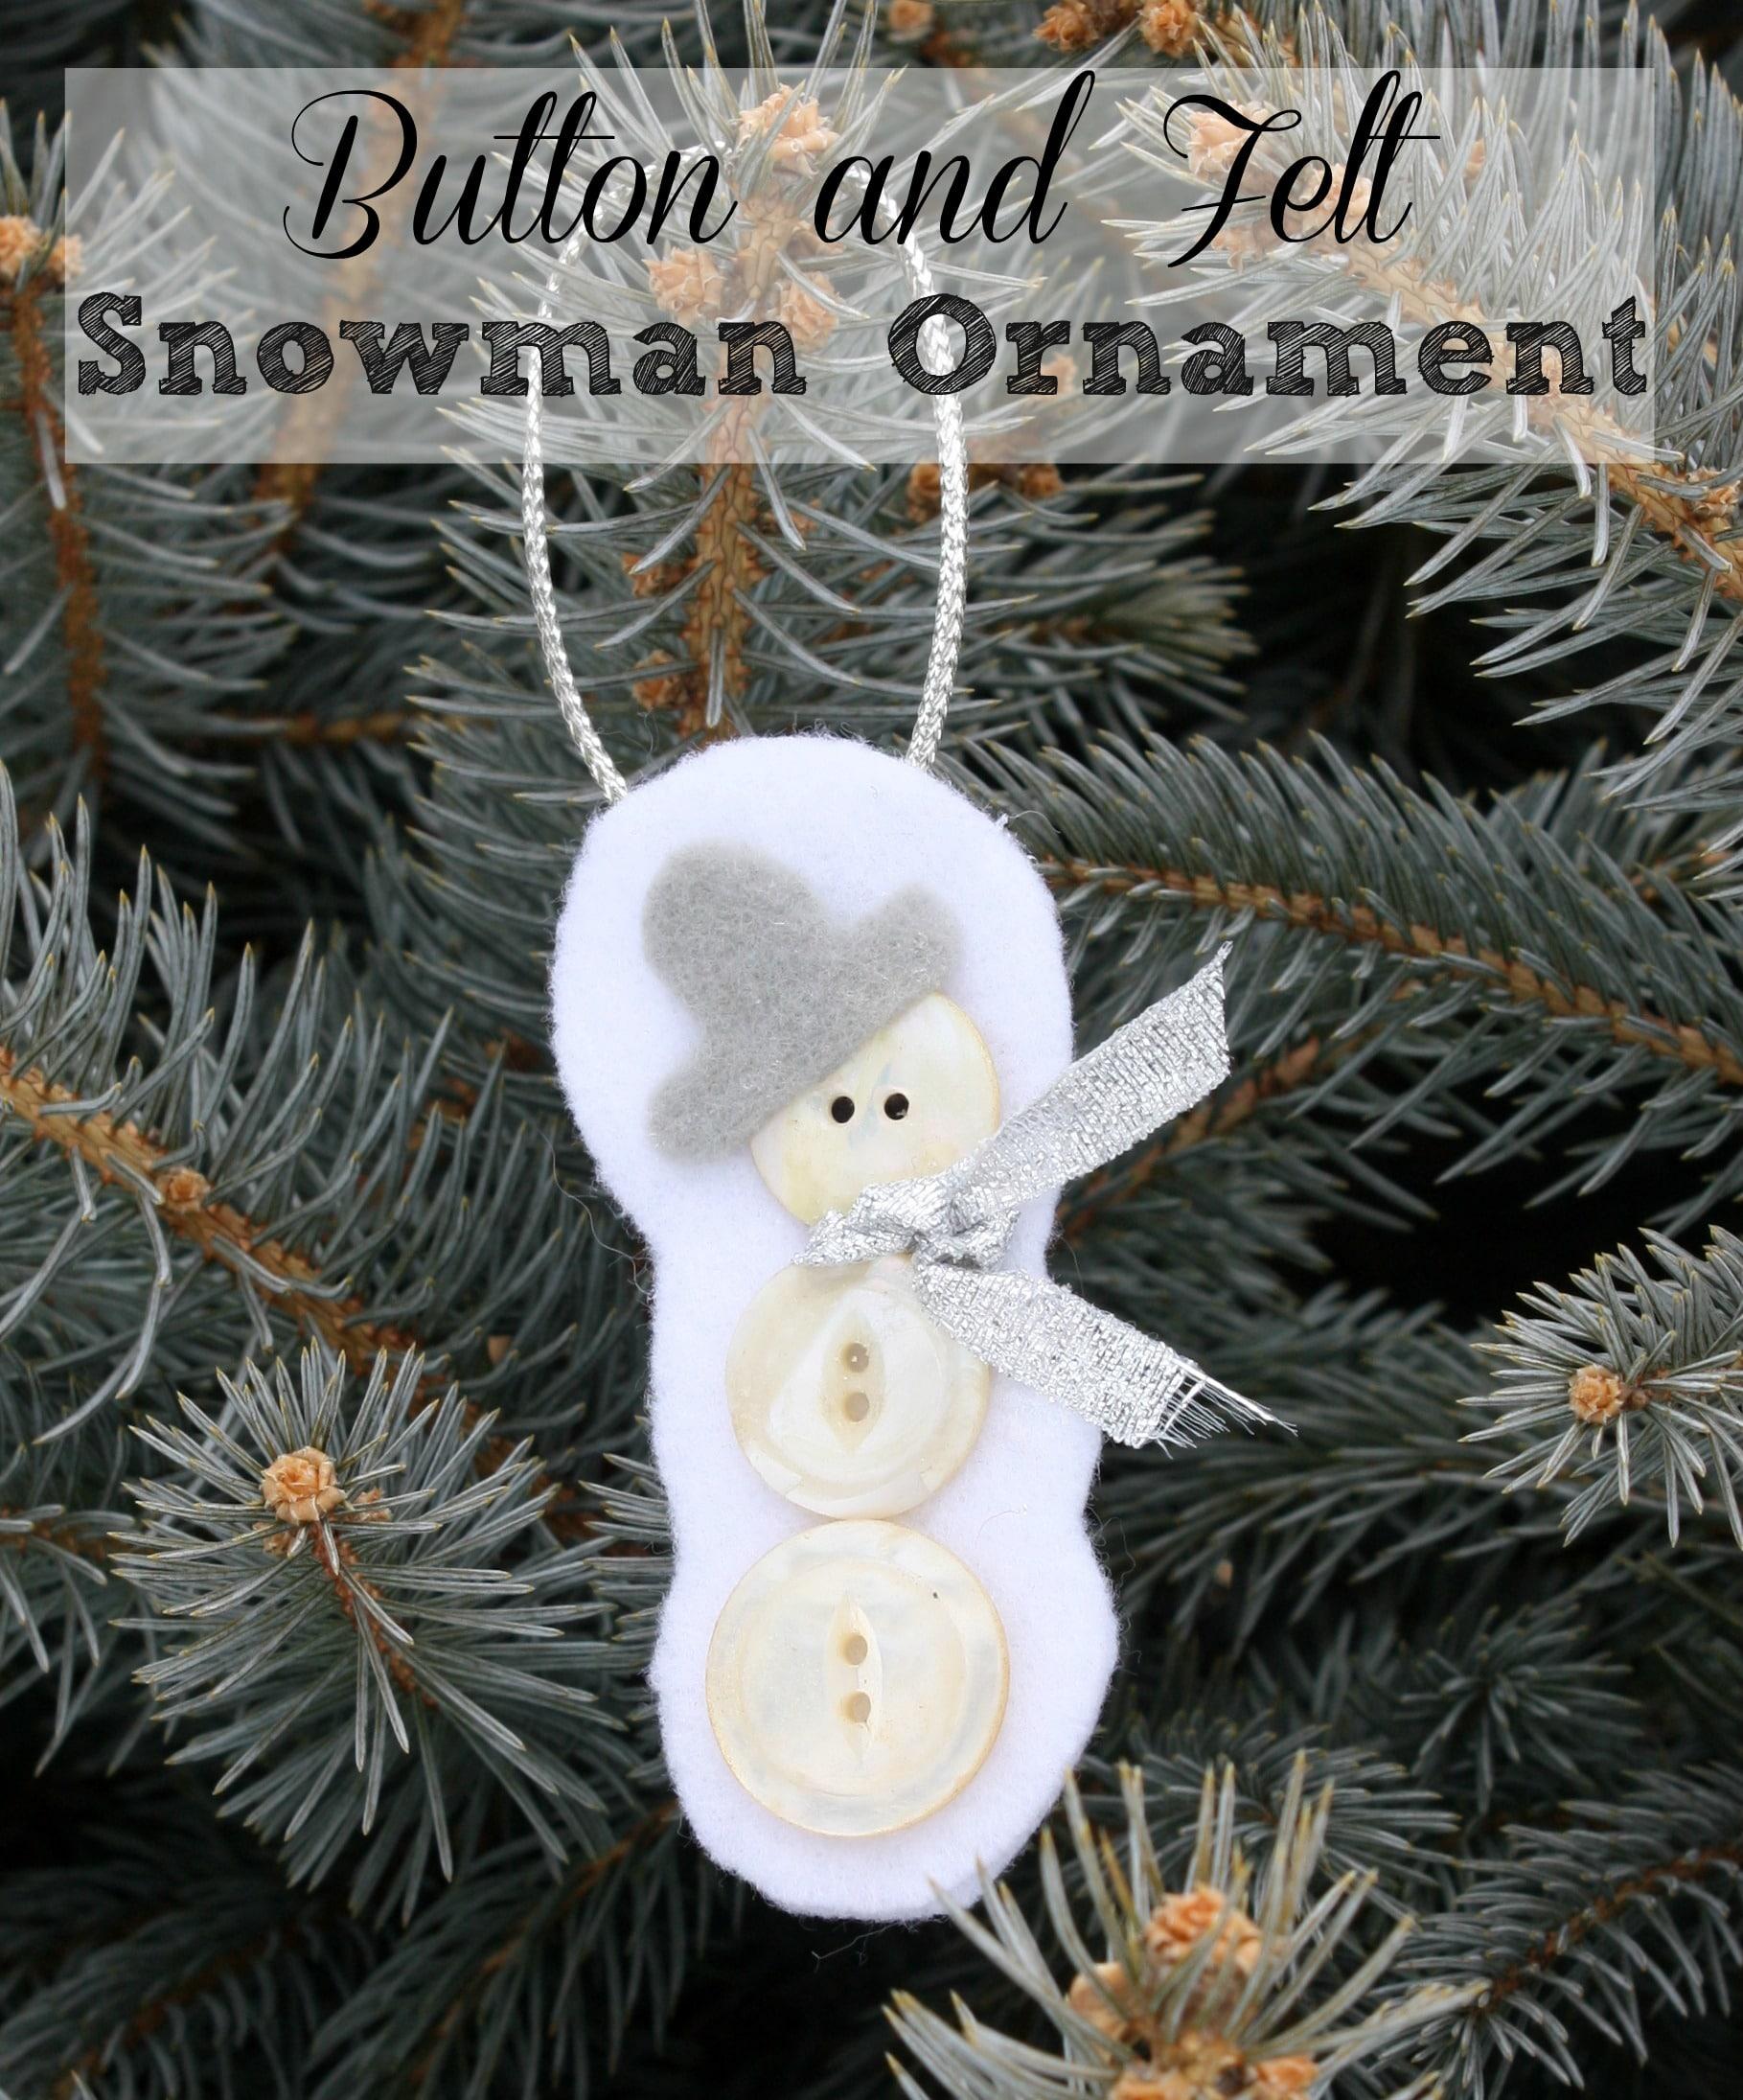 Button and Felt Snowman Ornament